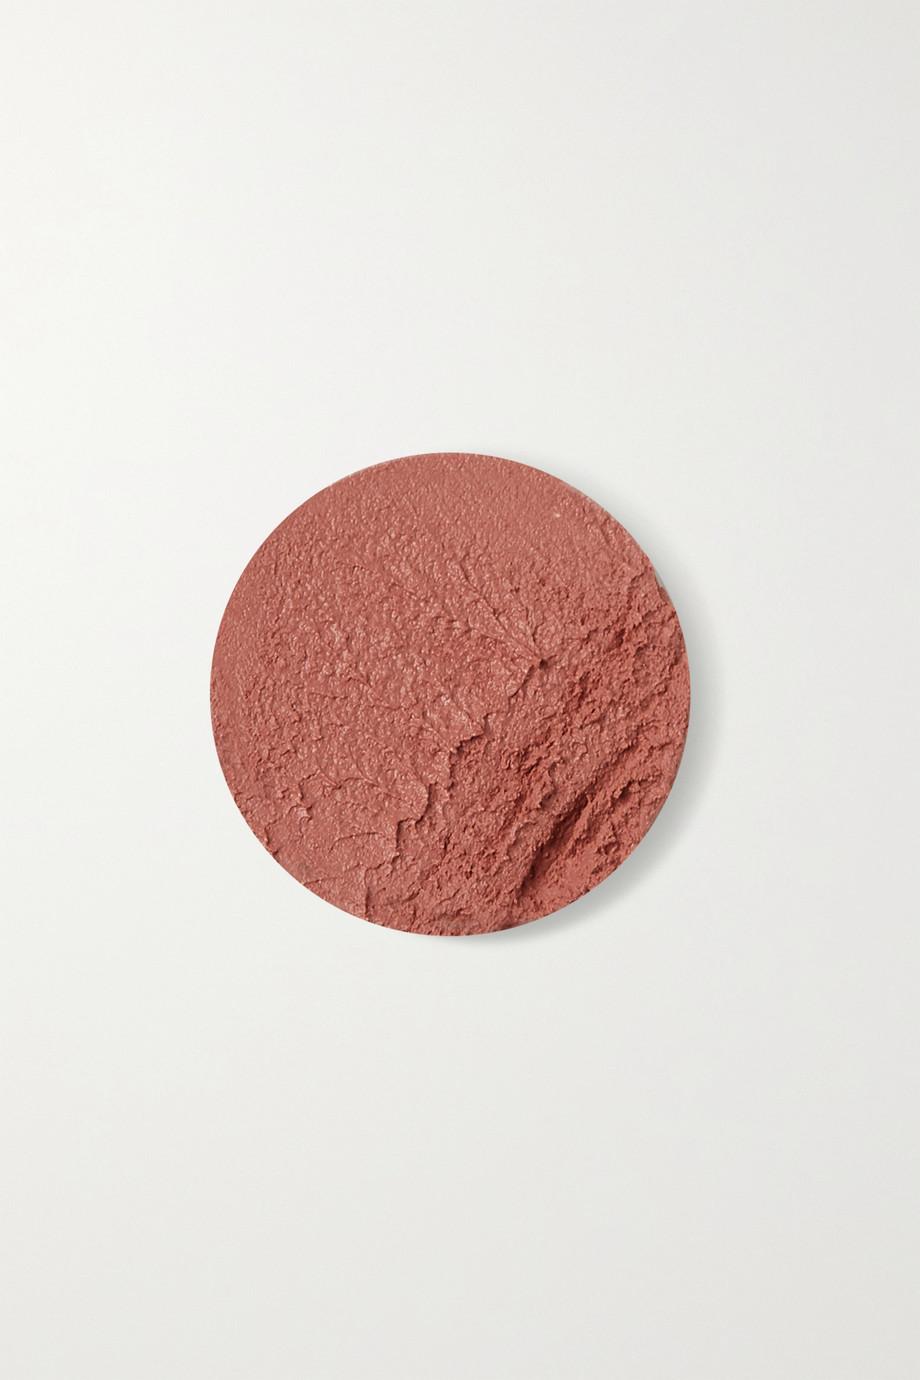 Kjaer Weis Lipstick - Effortless